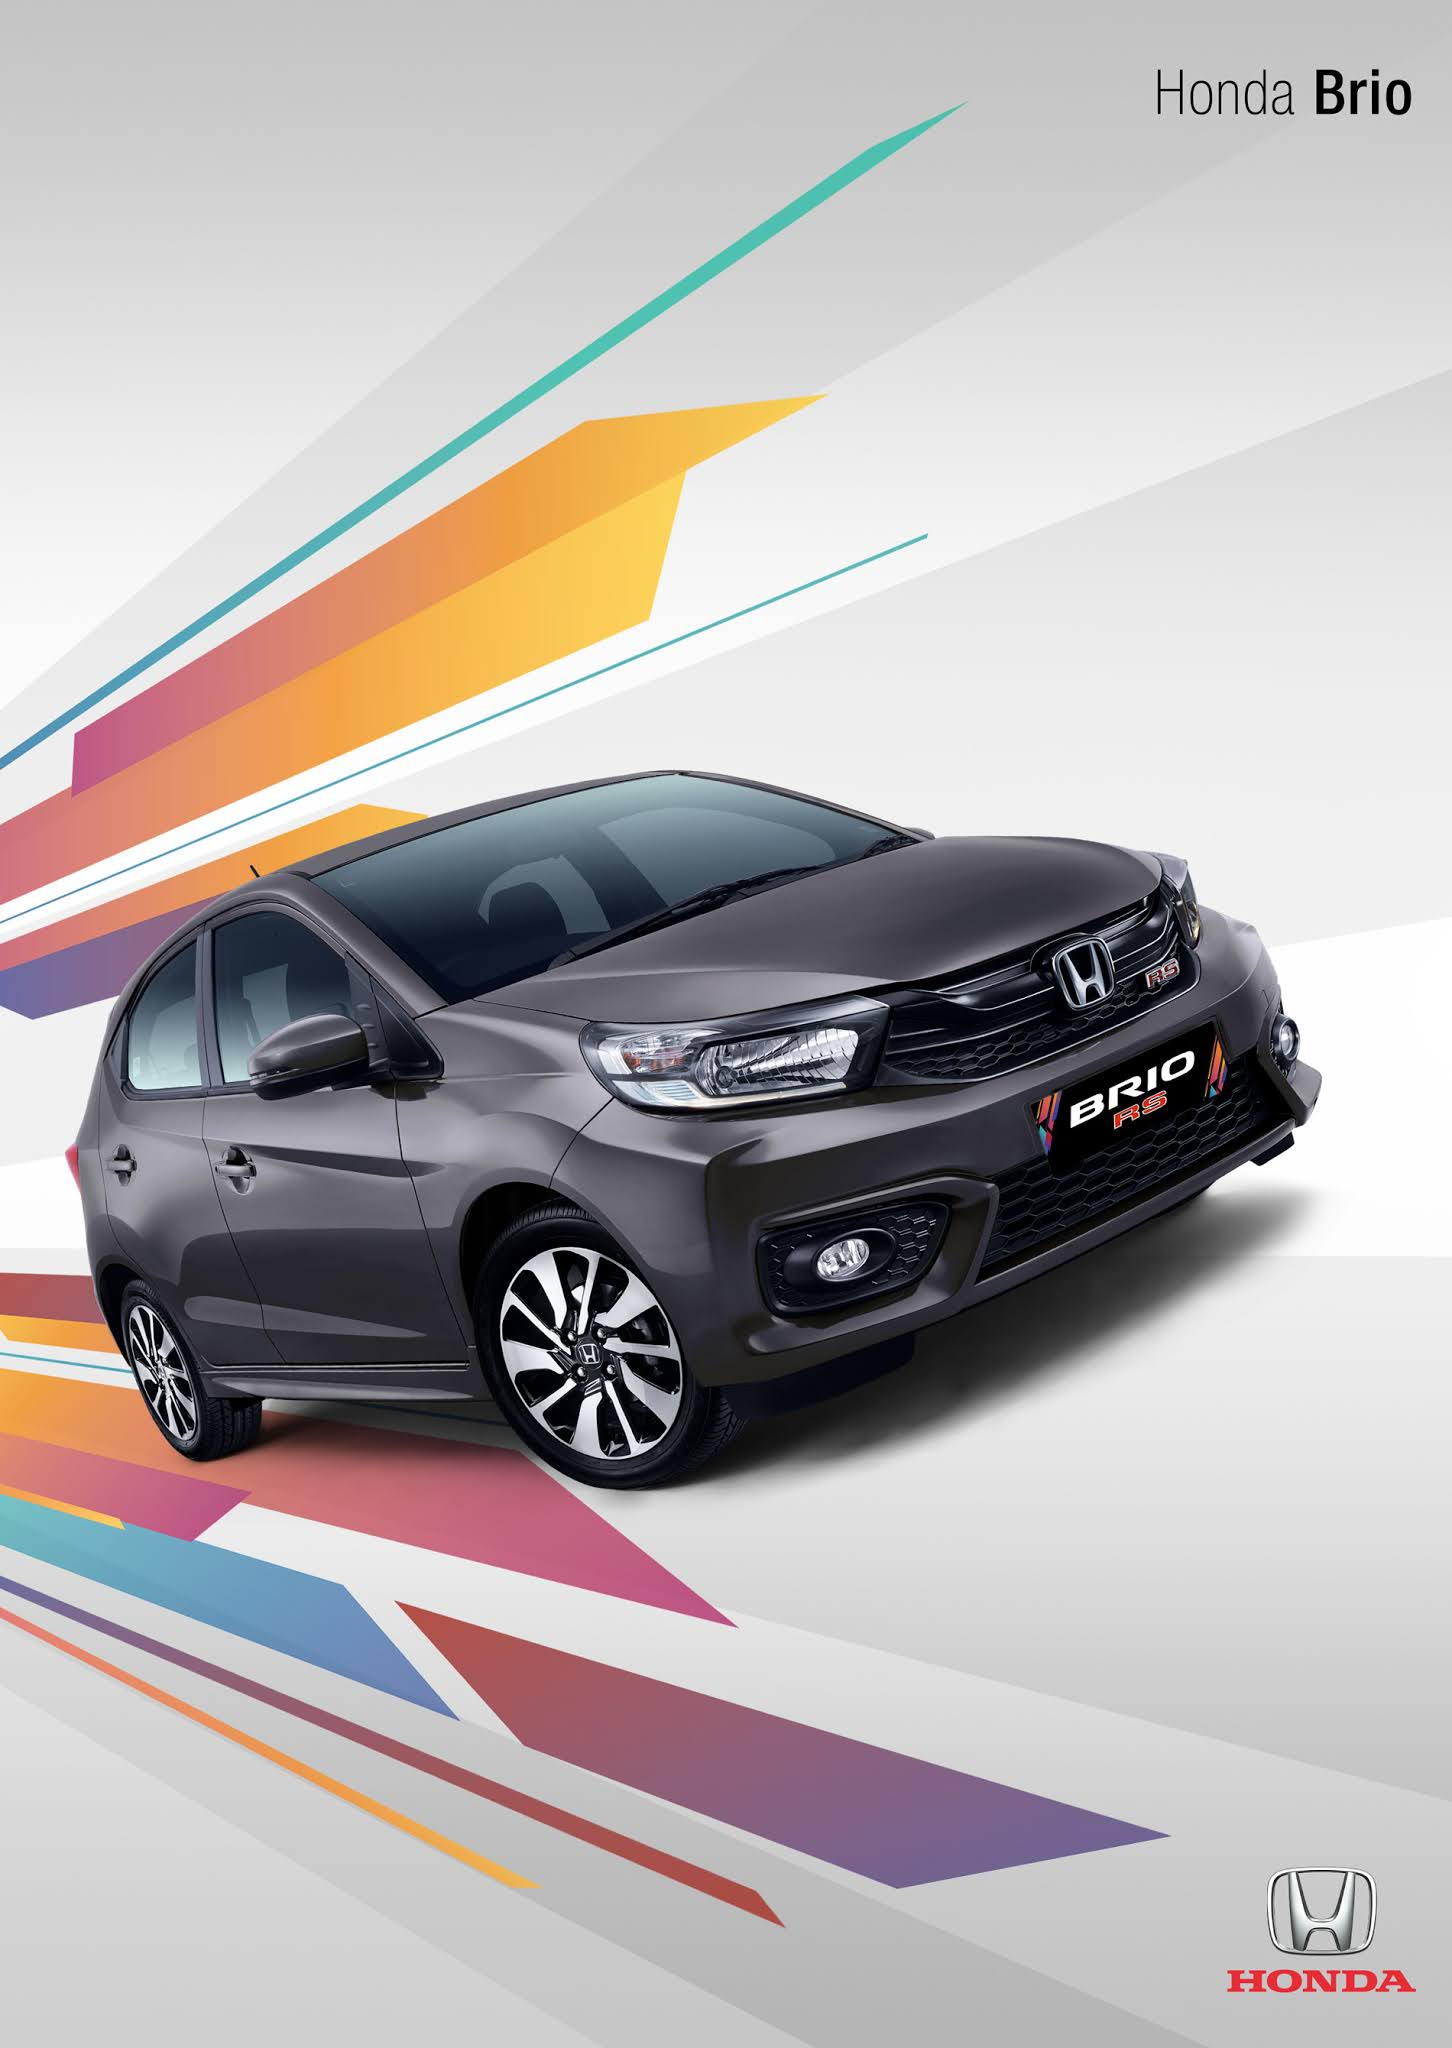 Harga Honda Brio Pekanbaru Riau Terbaru Bulan ini 2021